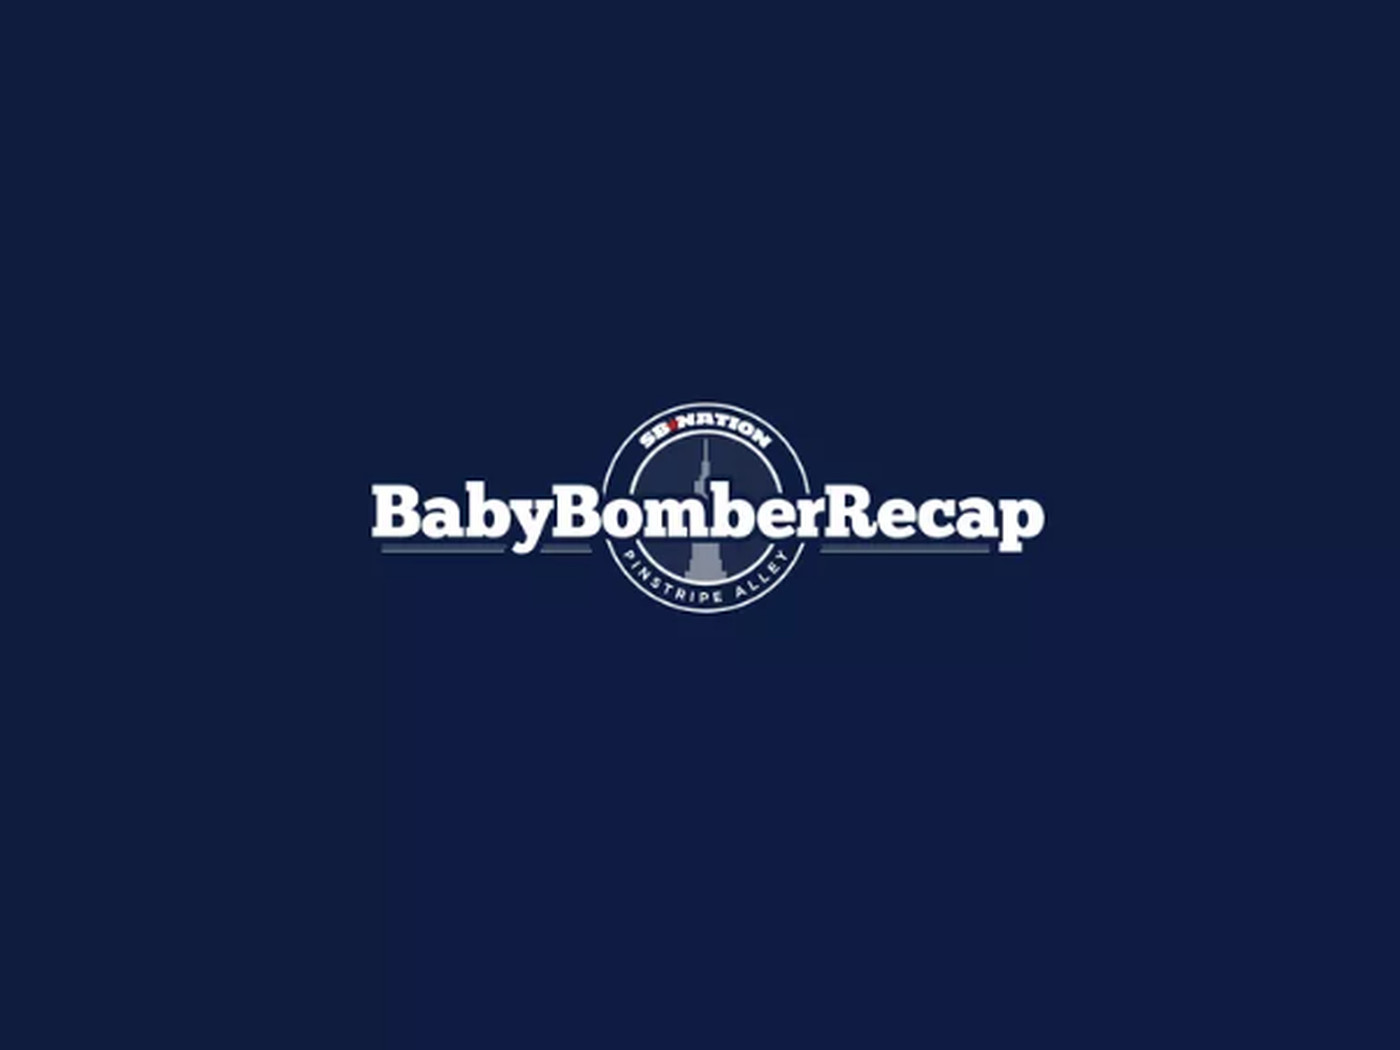 Yankees Prospects: Clarke Schmidt dazzles in Tampa victory